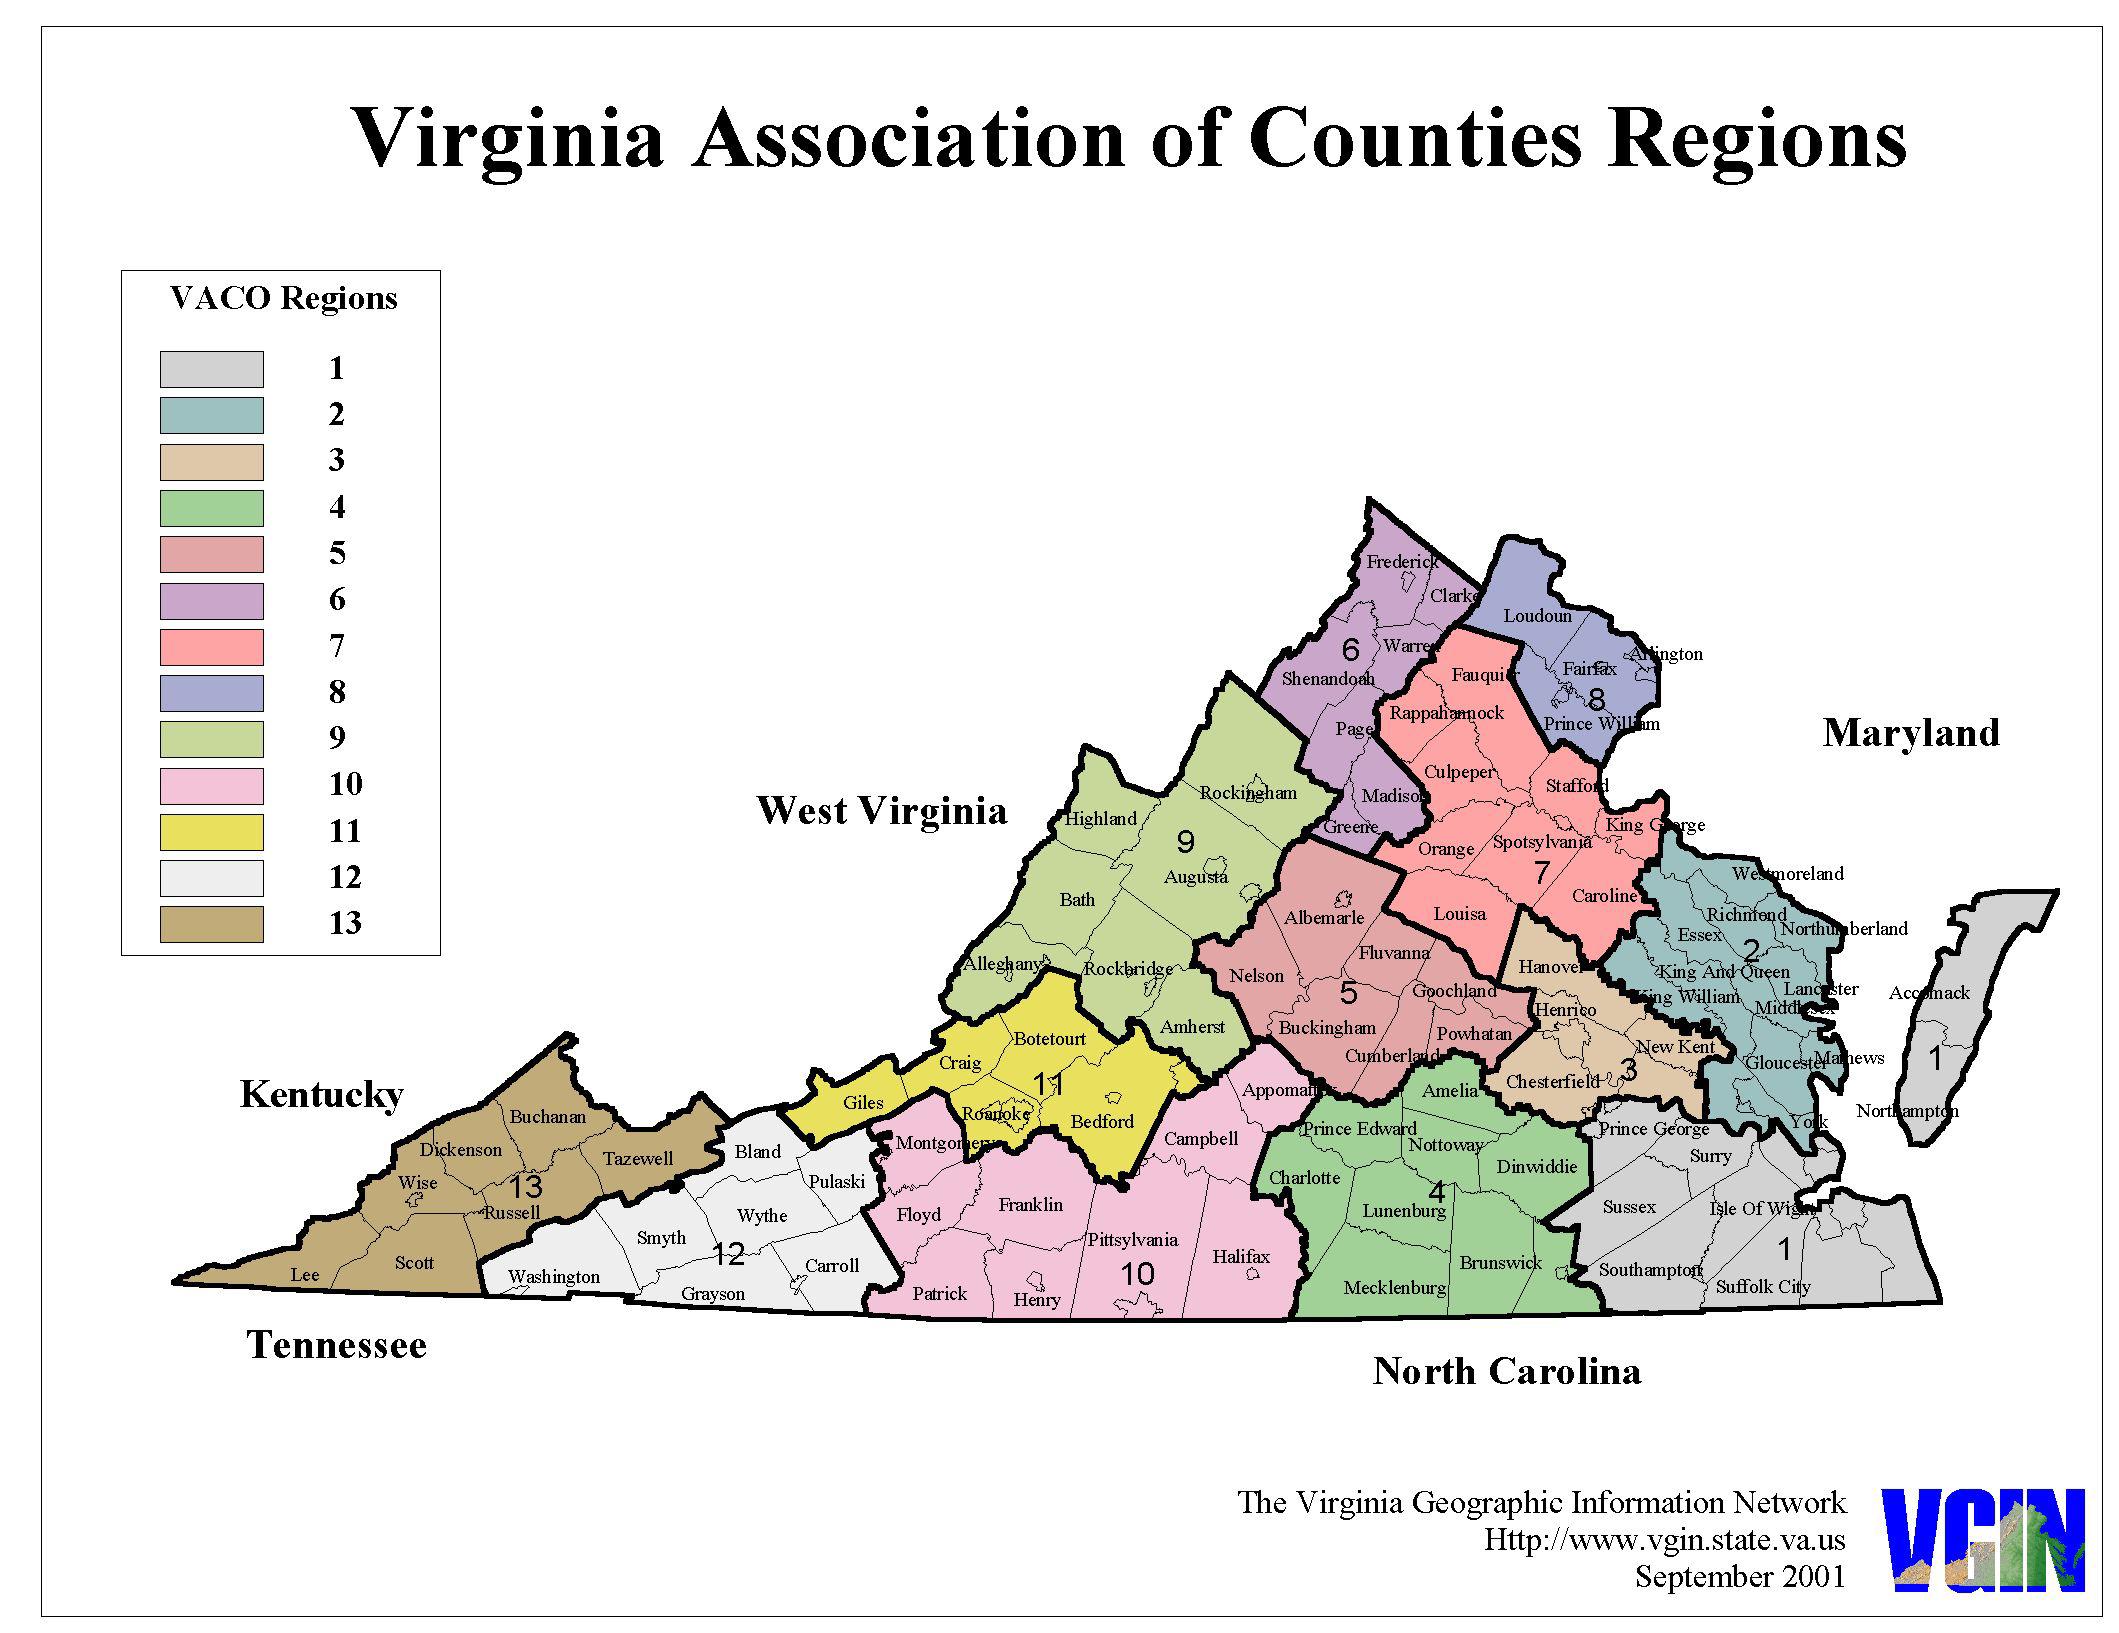 Map Of Virginia Counties 1800.Virginia Counties Map Regions Altizer Law